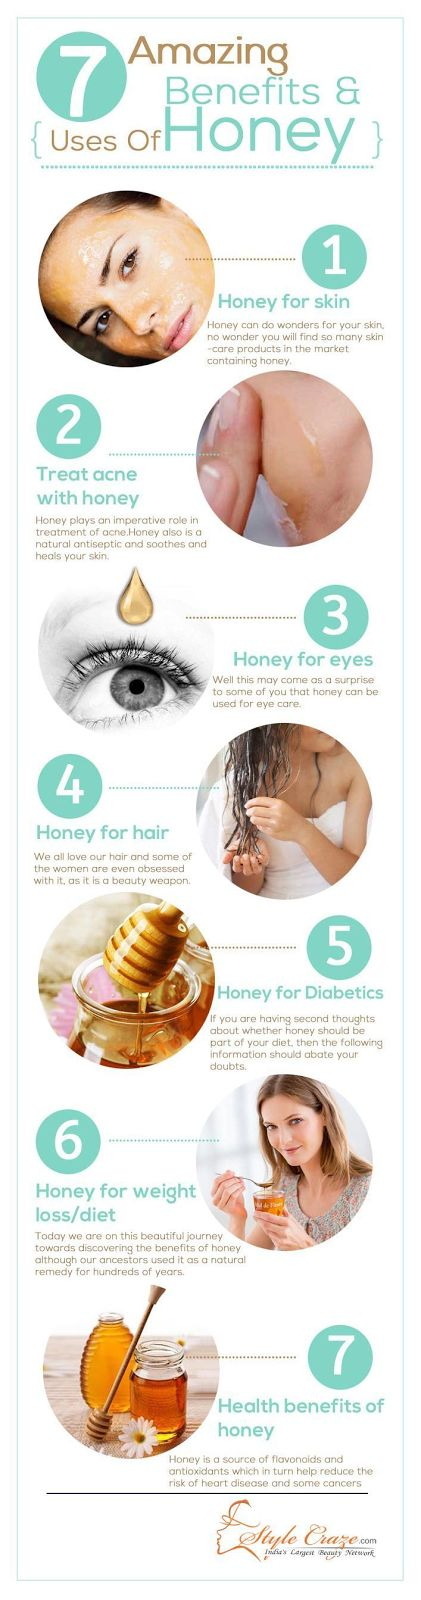 7 Amazing Benefits and Uses or Honey